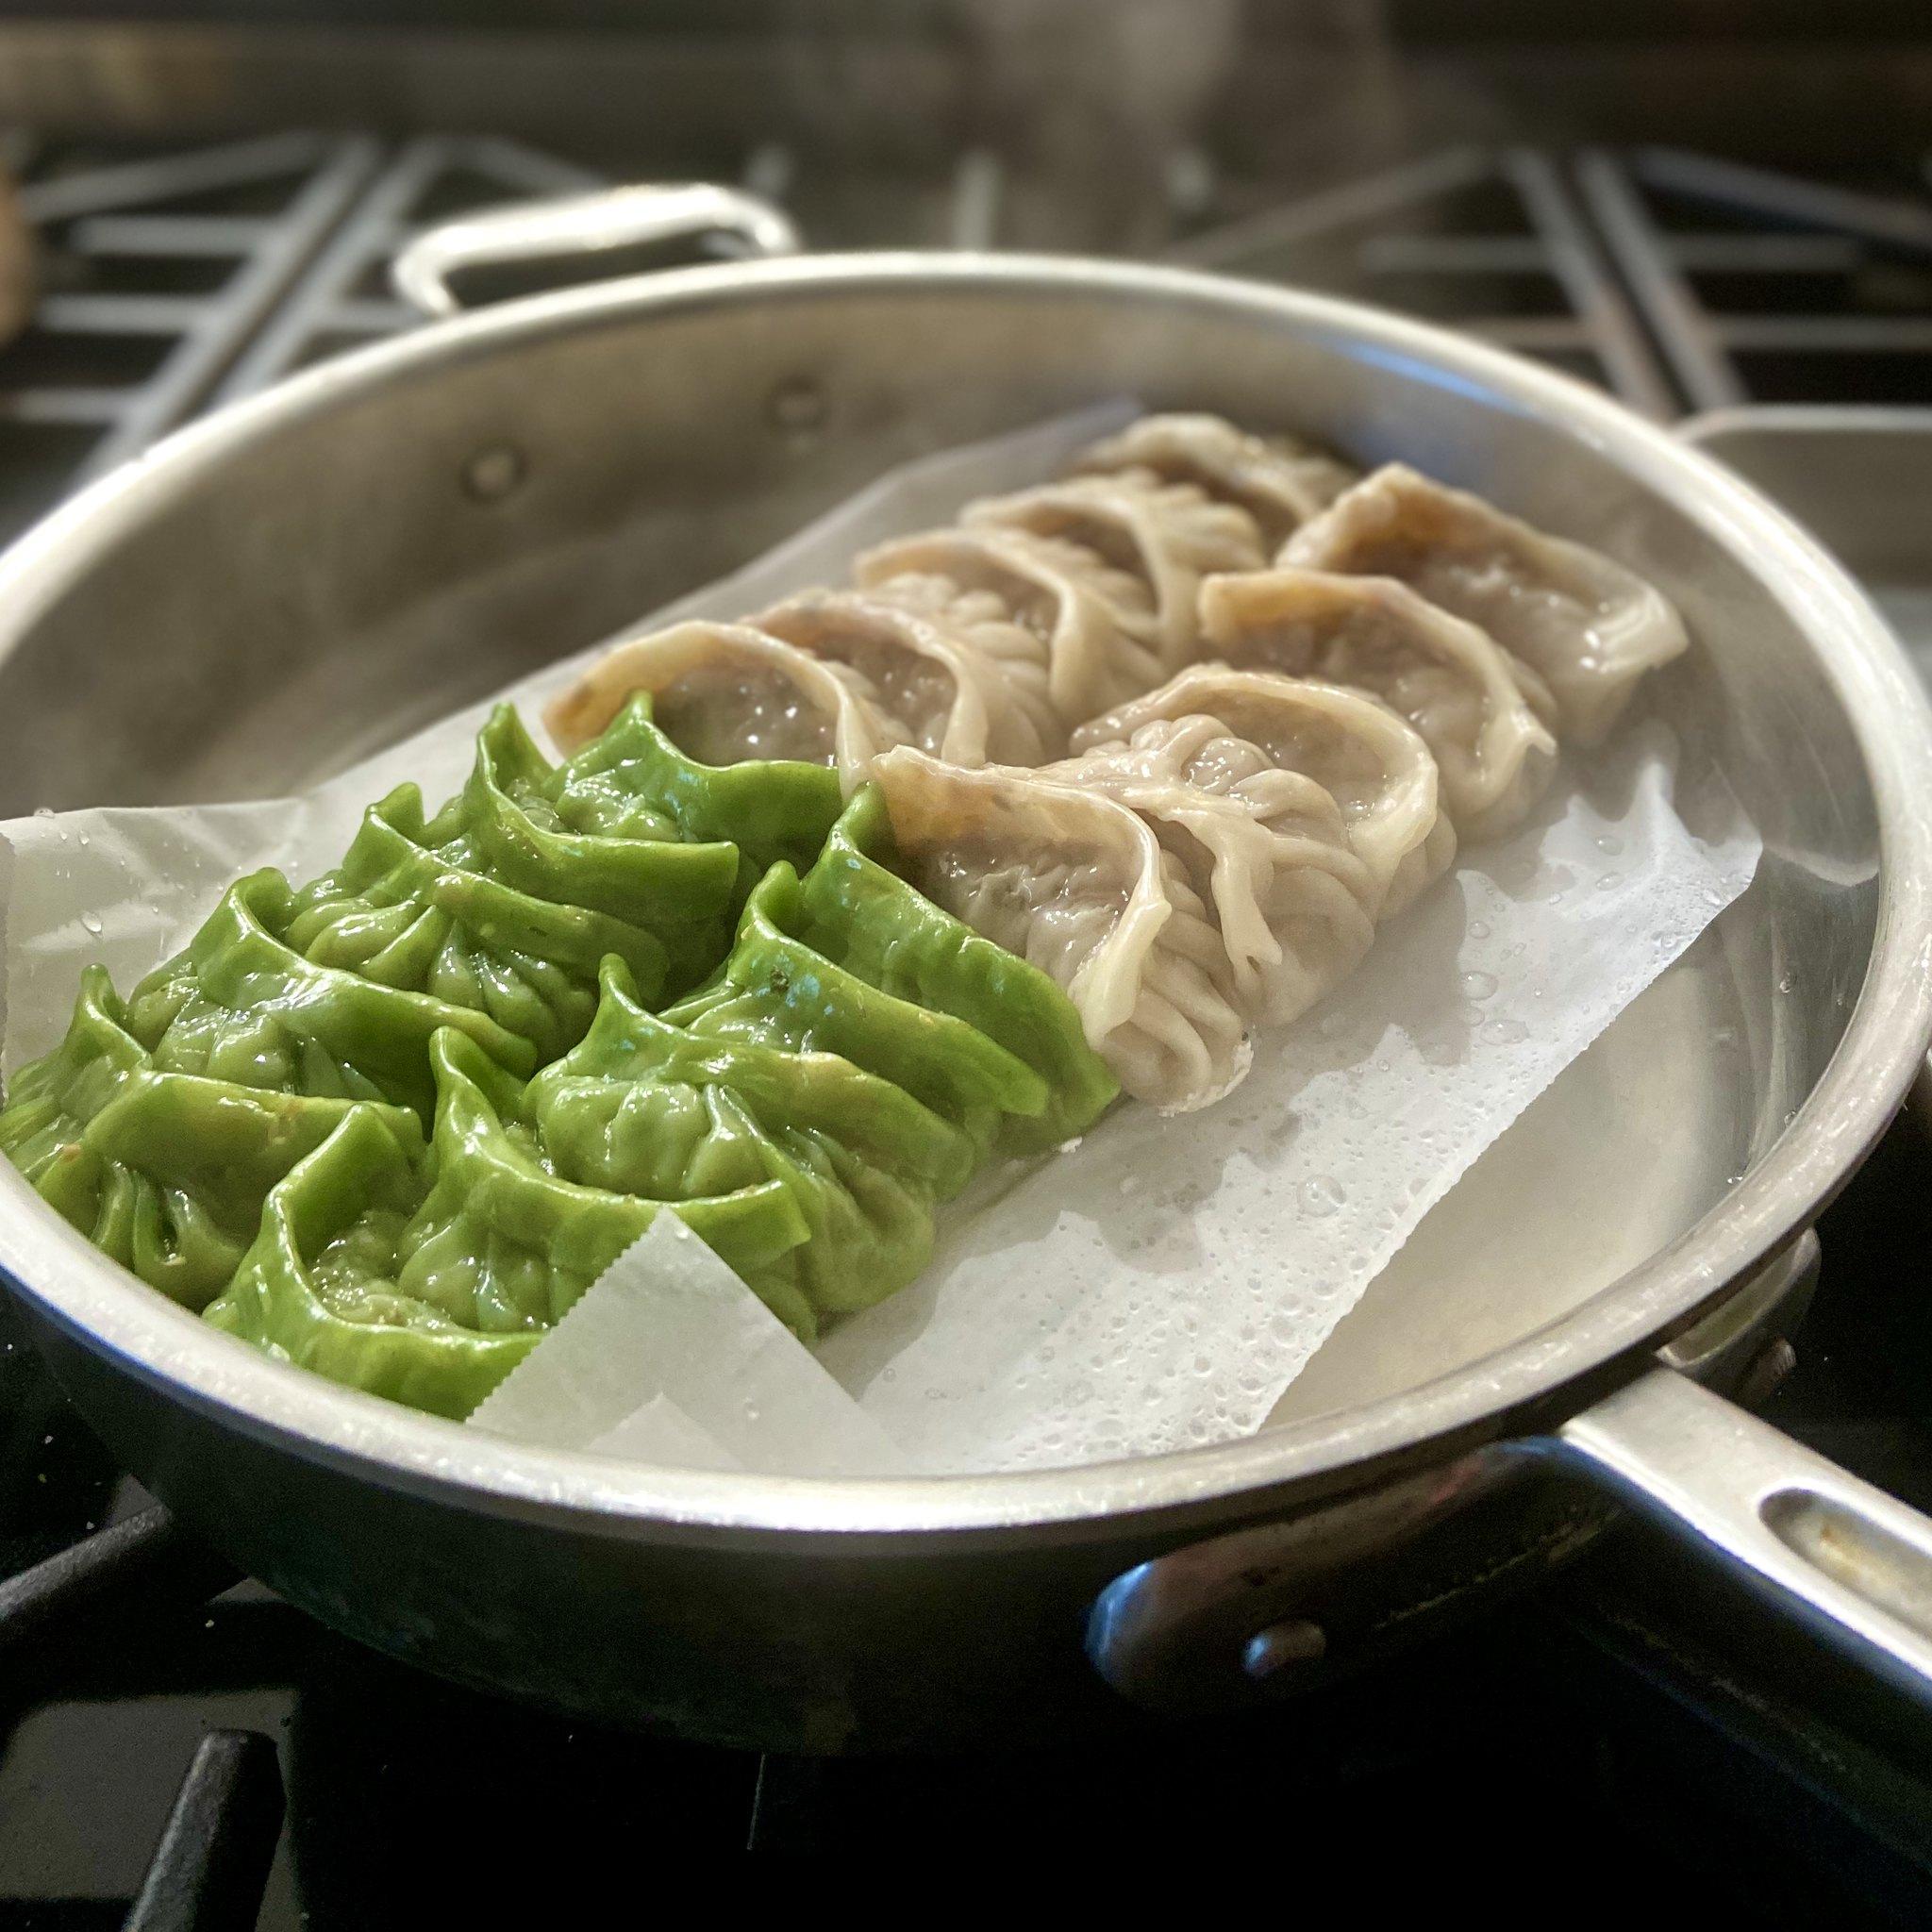 Dumplings from Li's Dim Sum